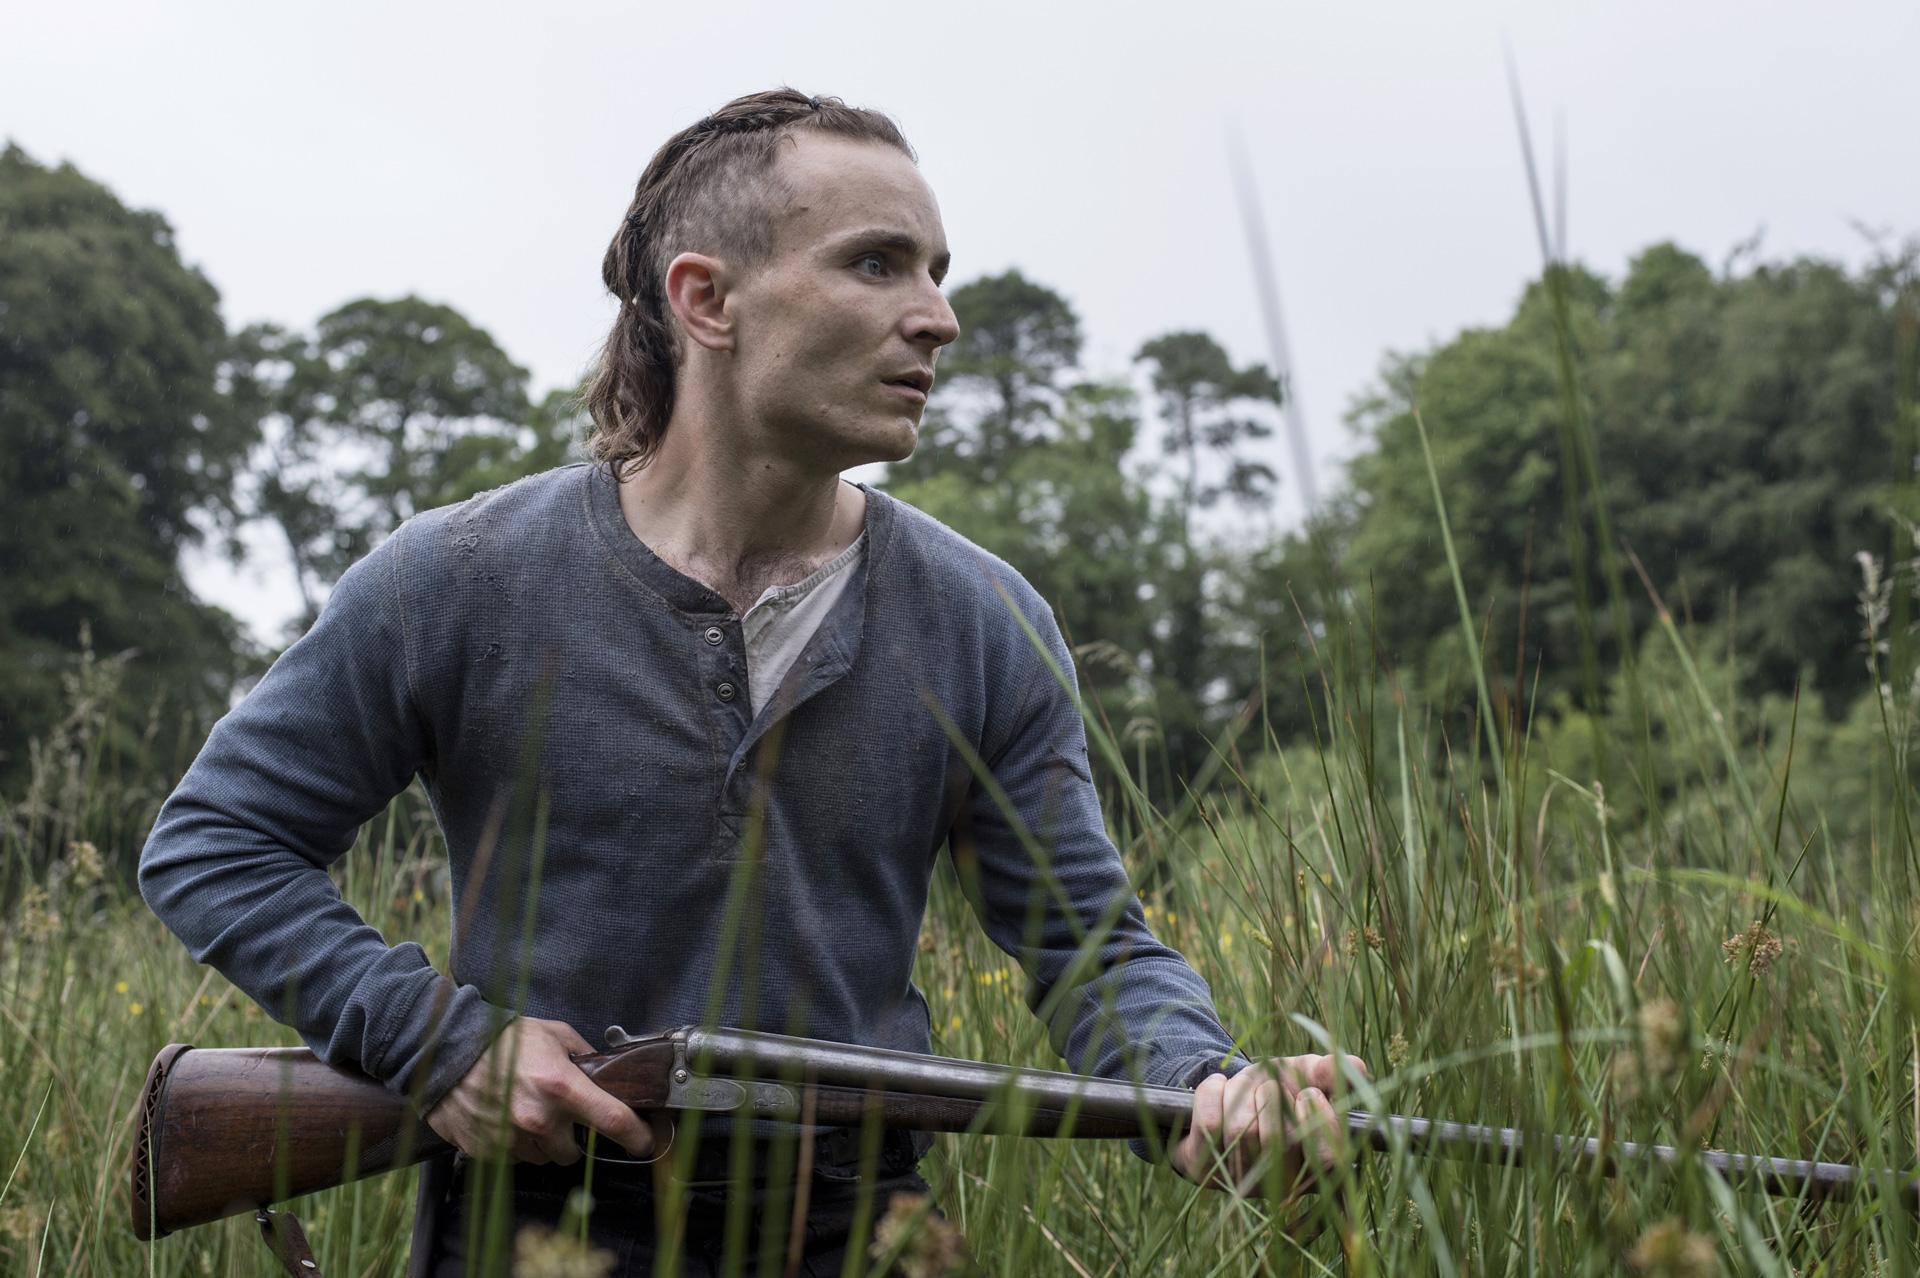 Martin McCann as The Survivalist (2015)